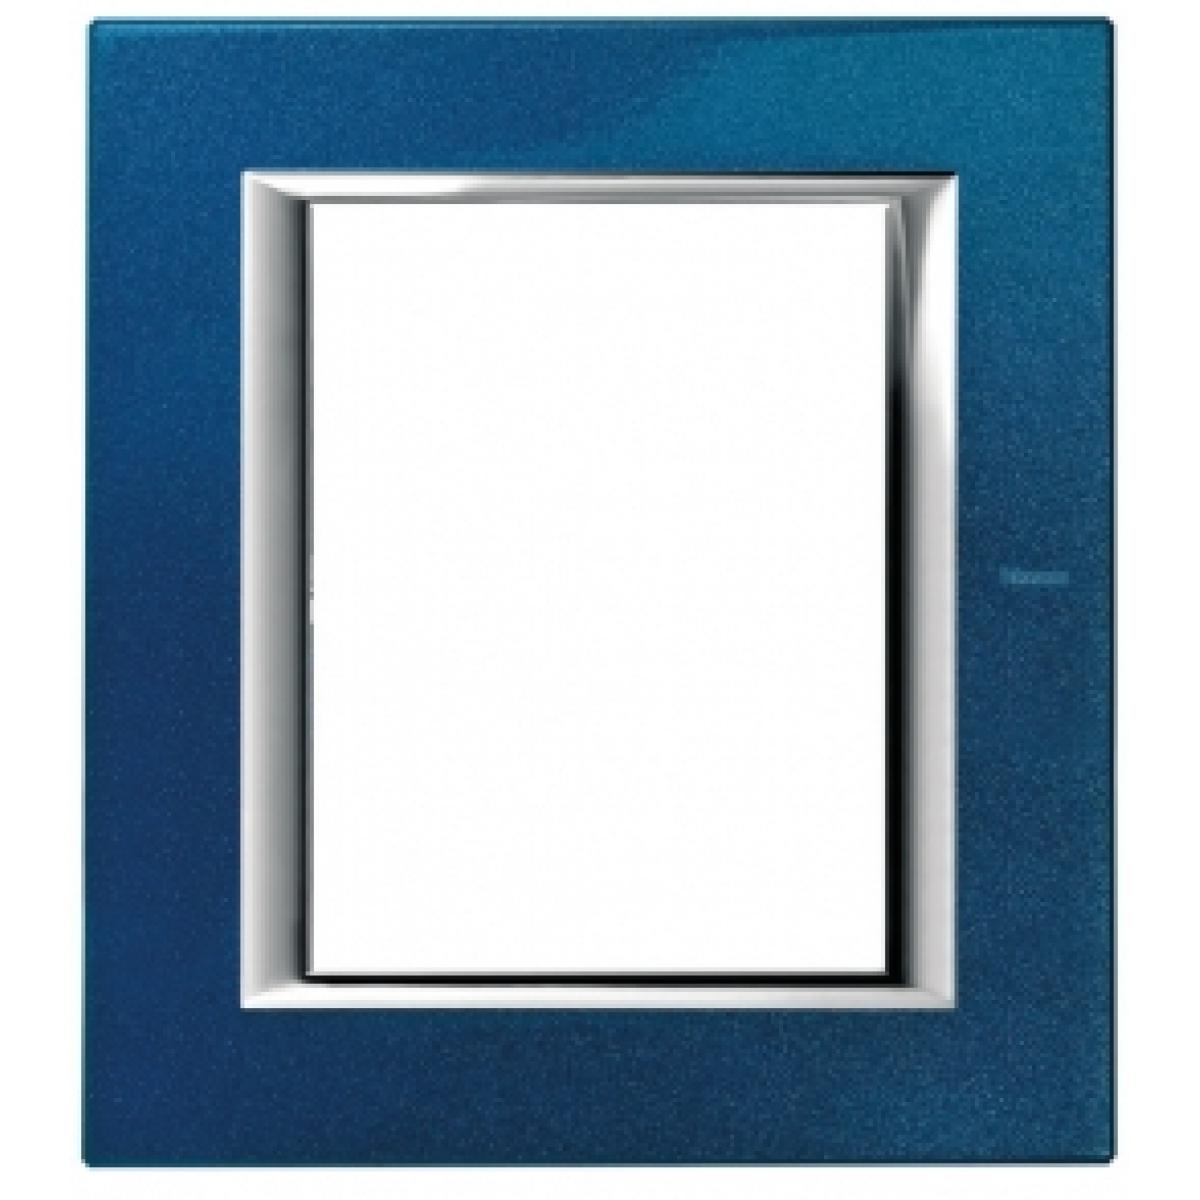 Placca 3+3 Bticino Axolute Blu Meissen HA4826BM